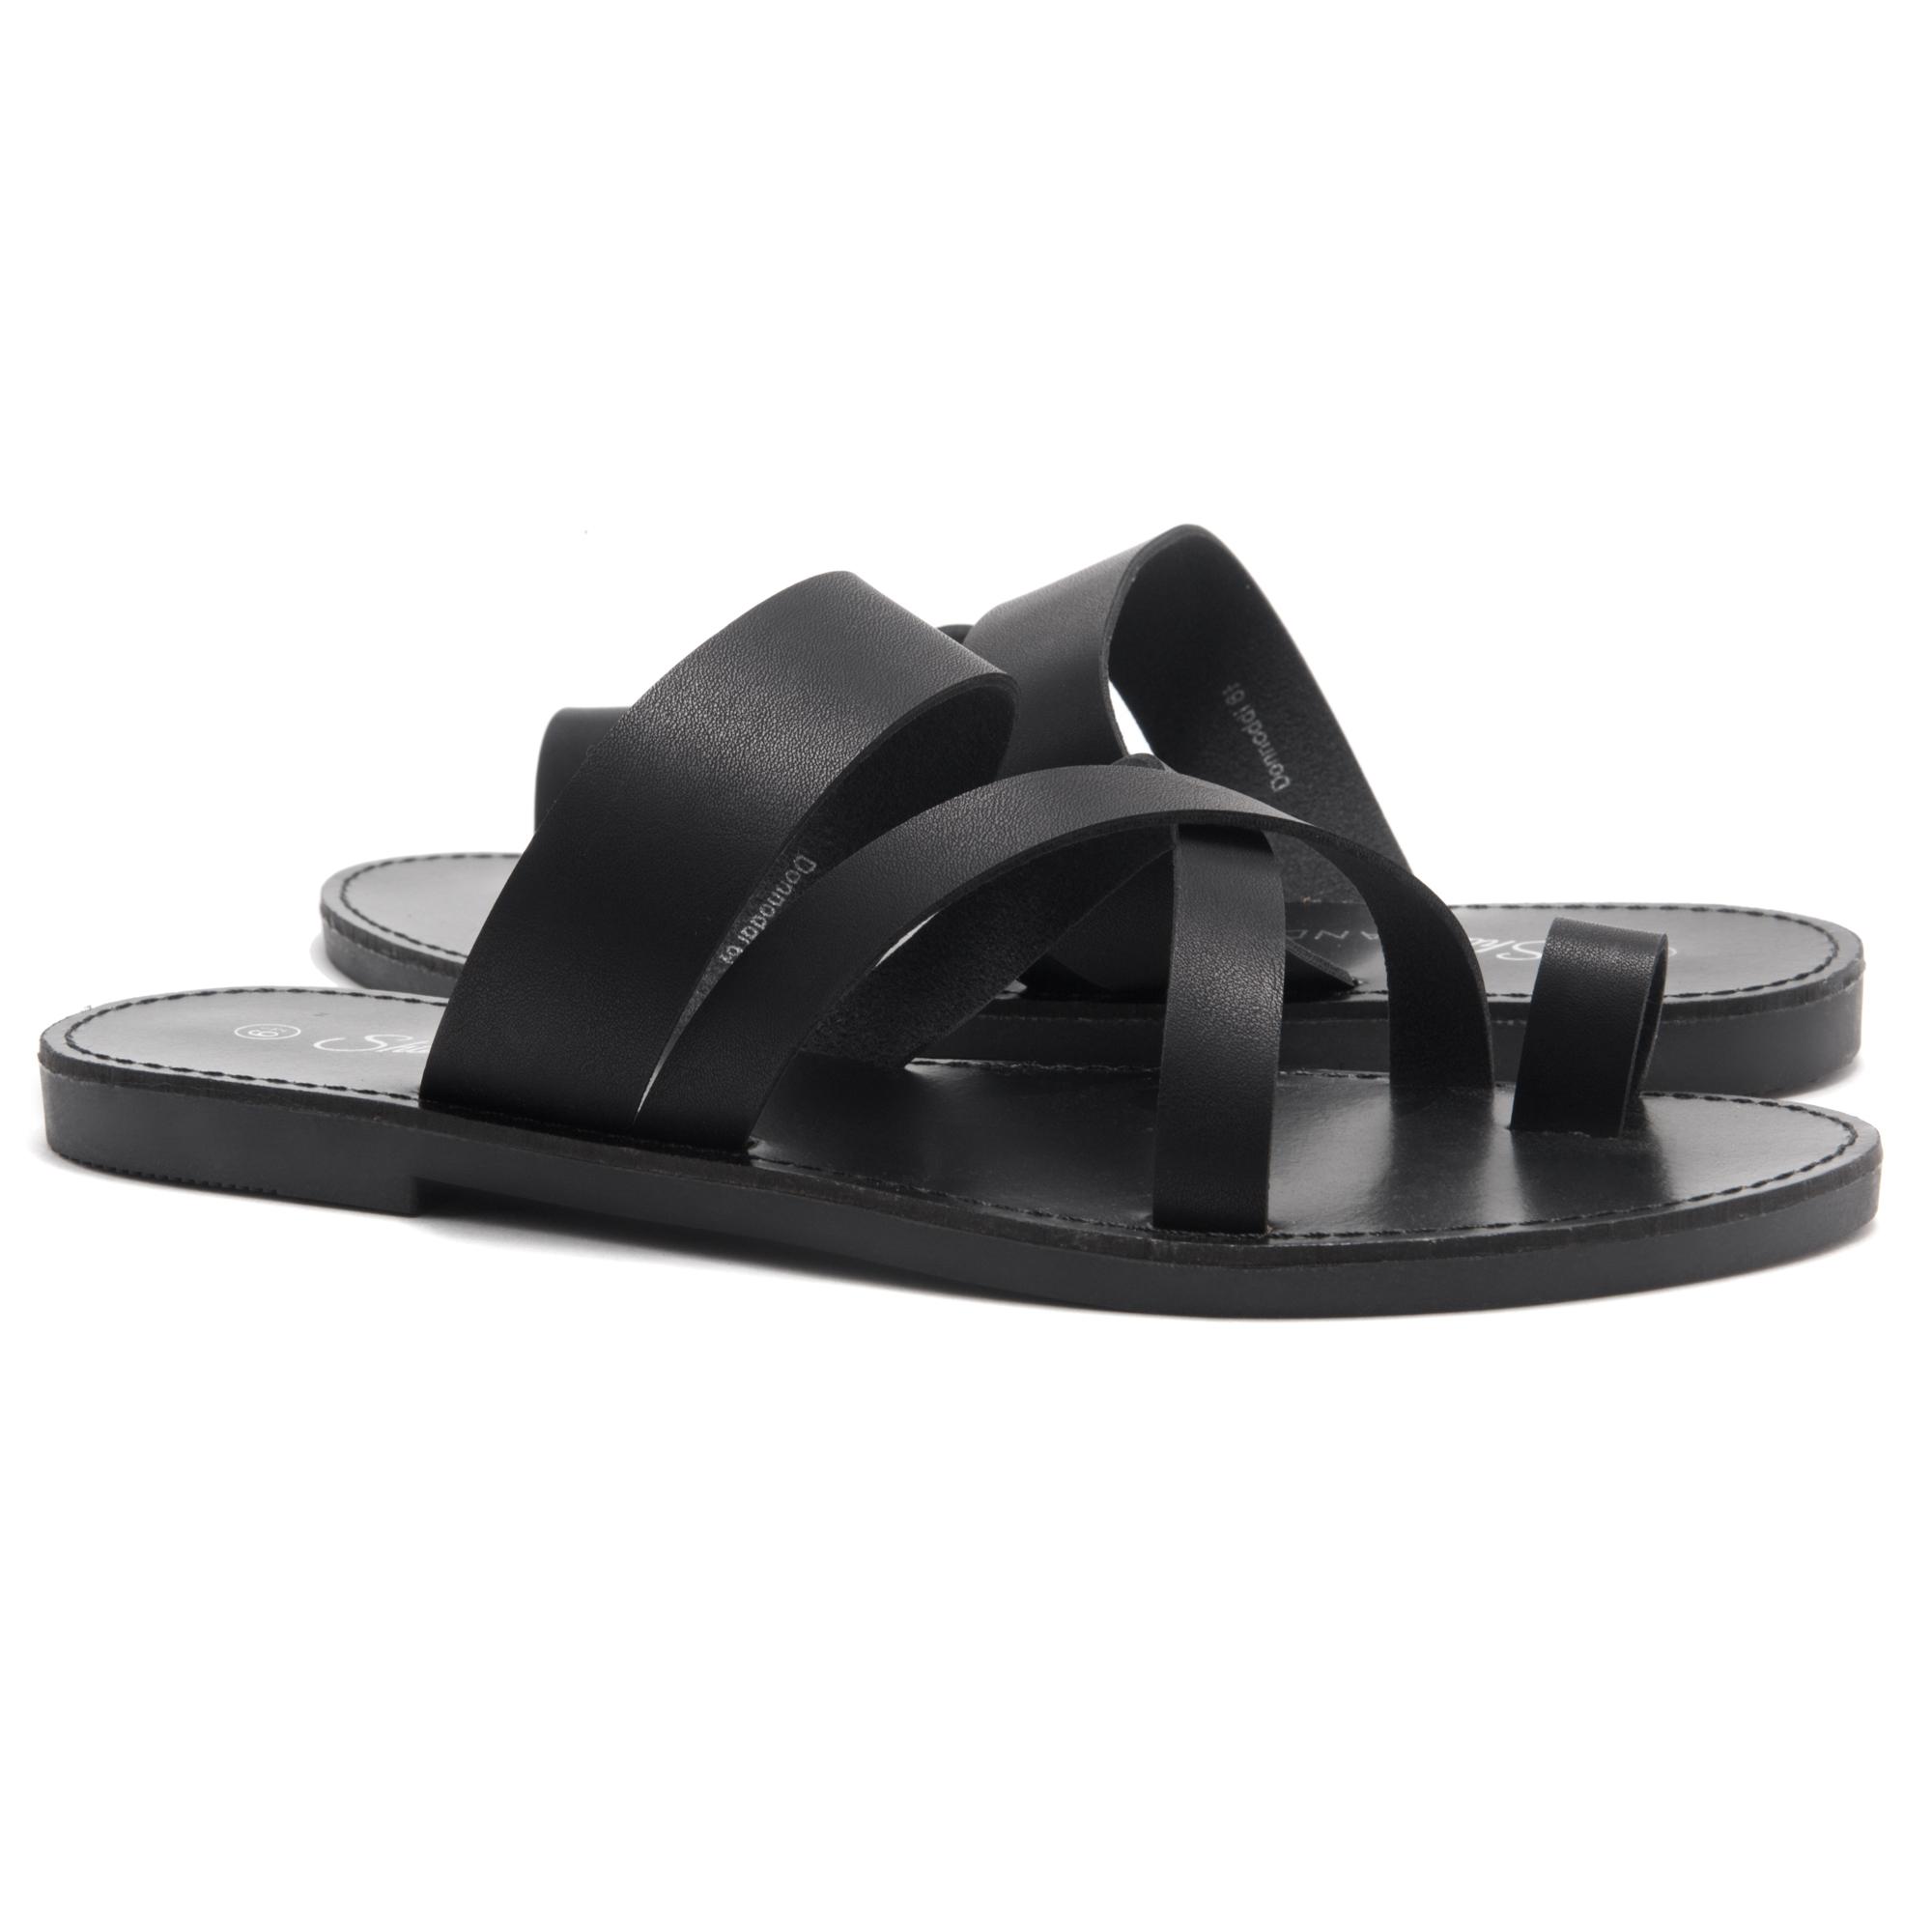 1ae5b4ebbe46 Women s Donnoddi Toe Ring Sandal with Unique Crisscross Straps (Black)